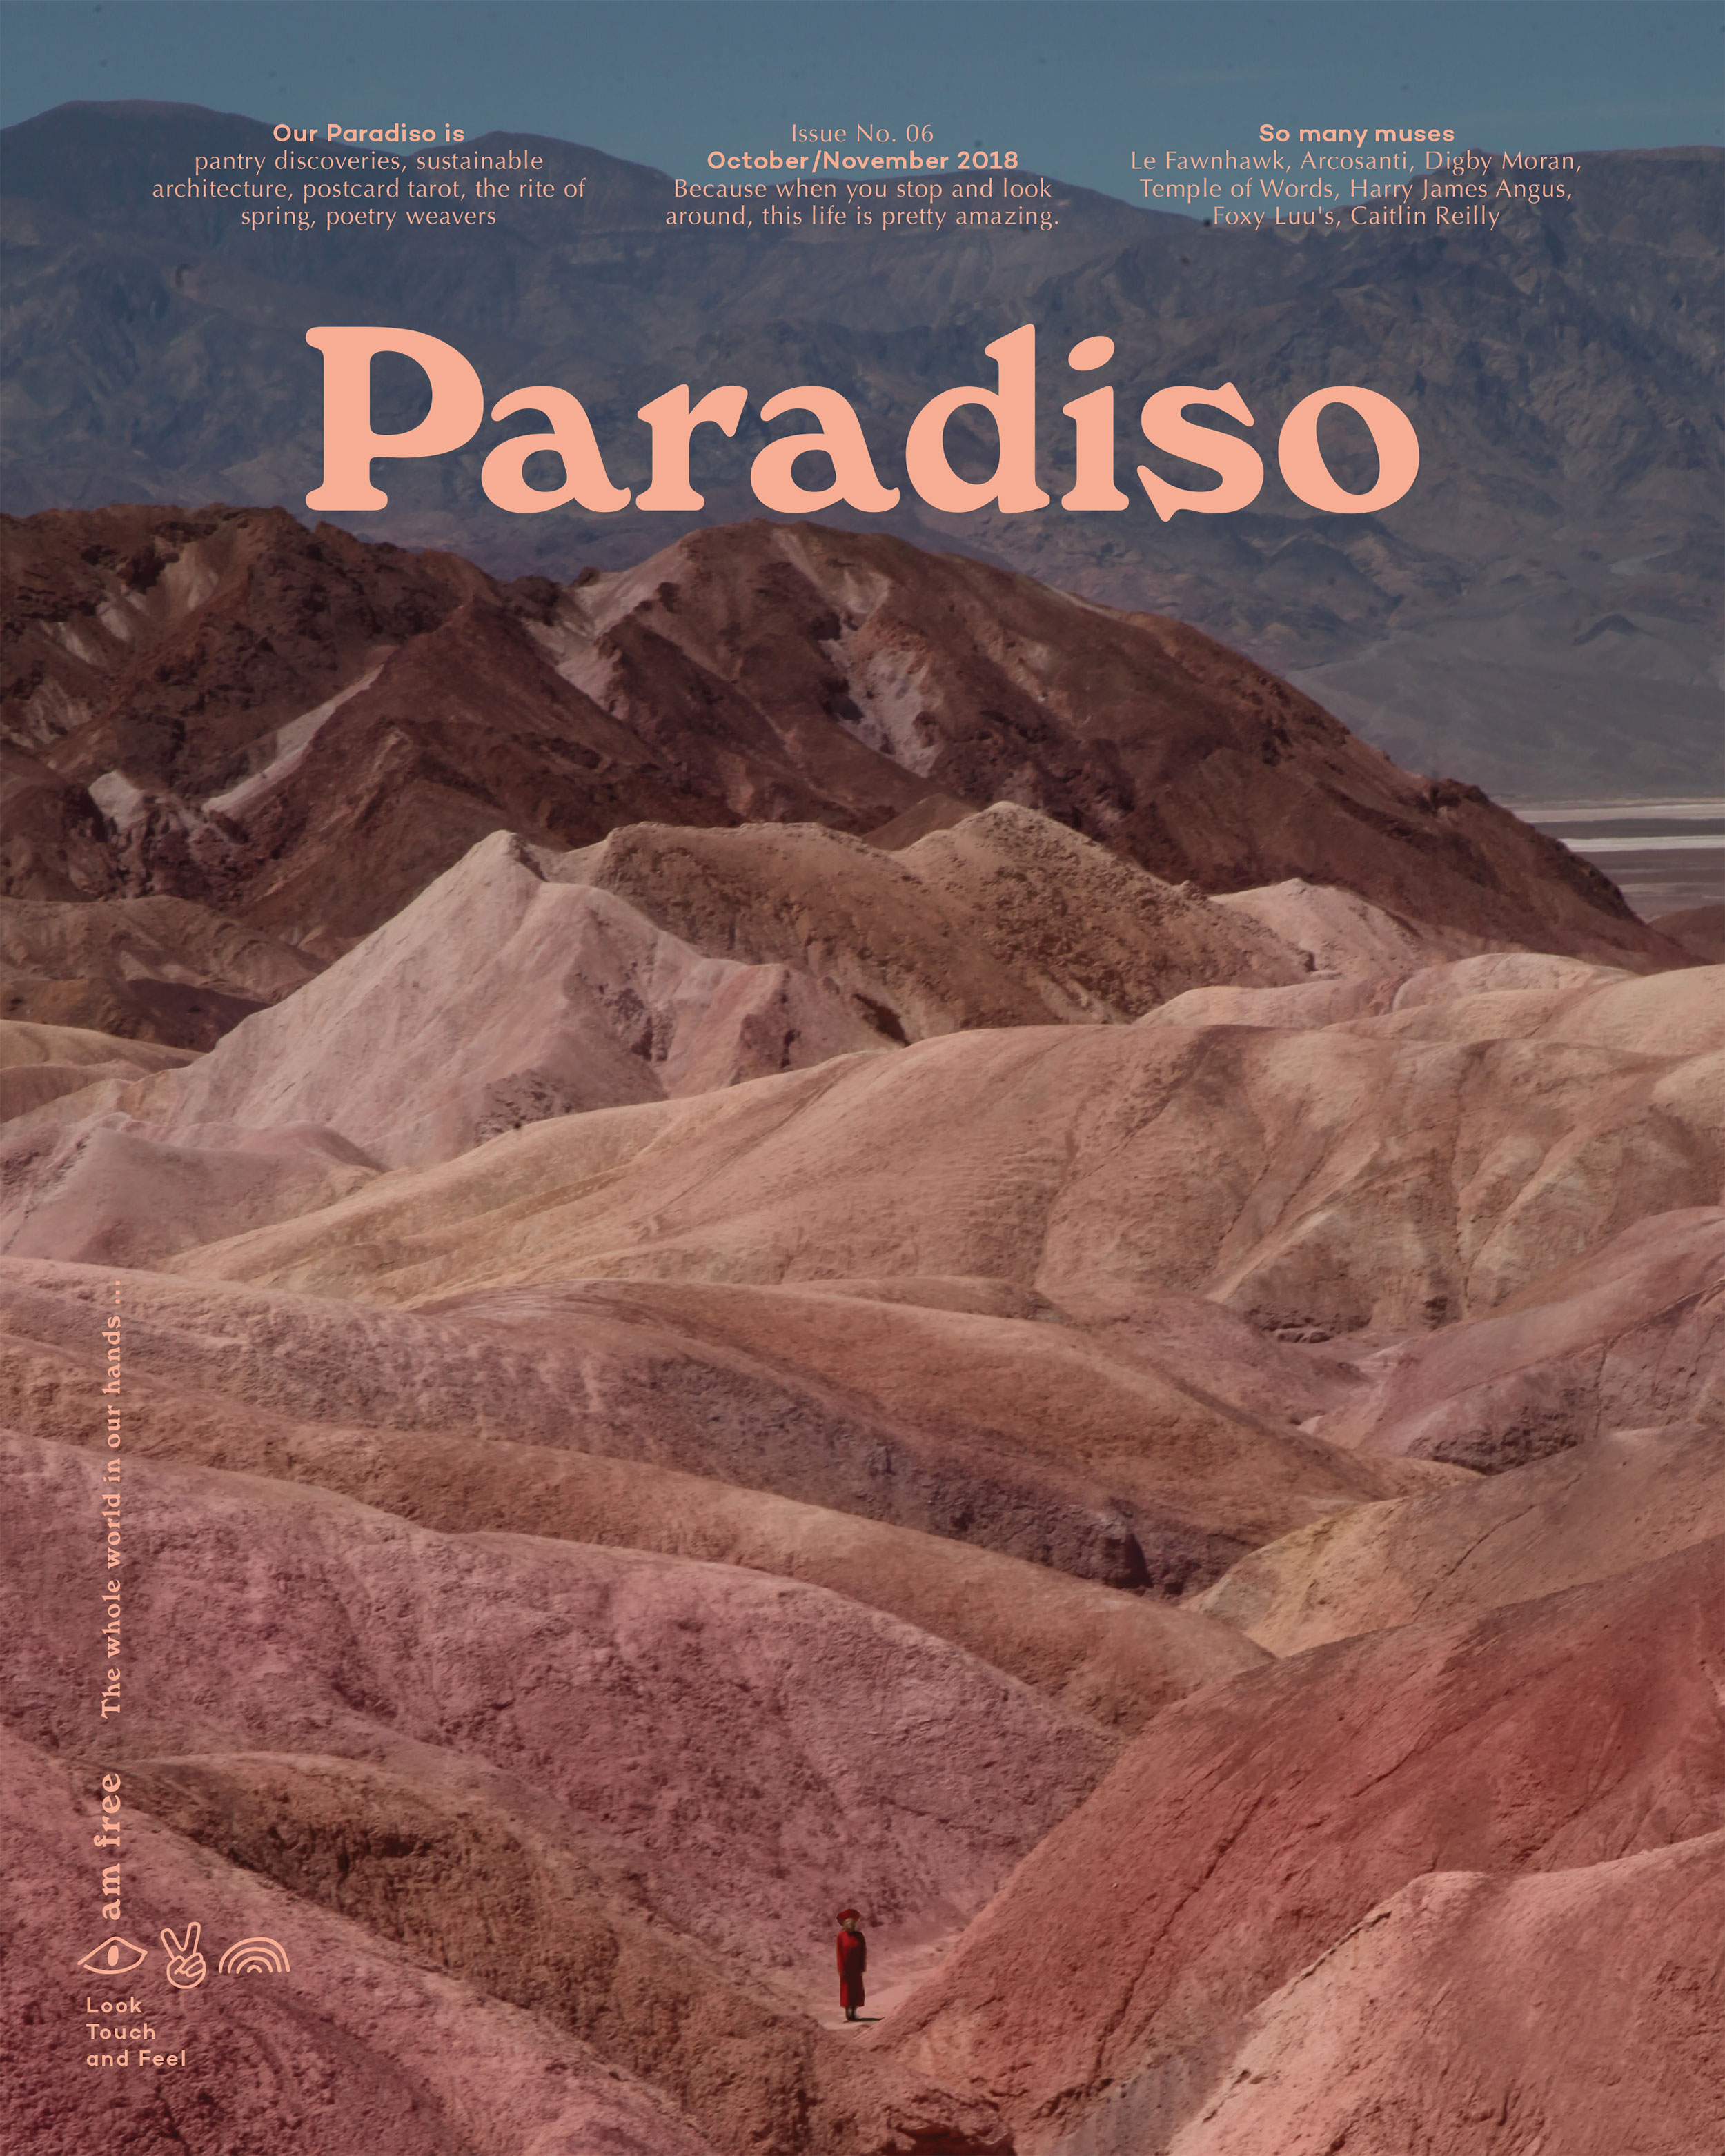 Paradiso-06-cover.jpg